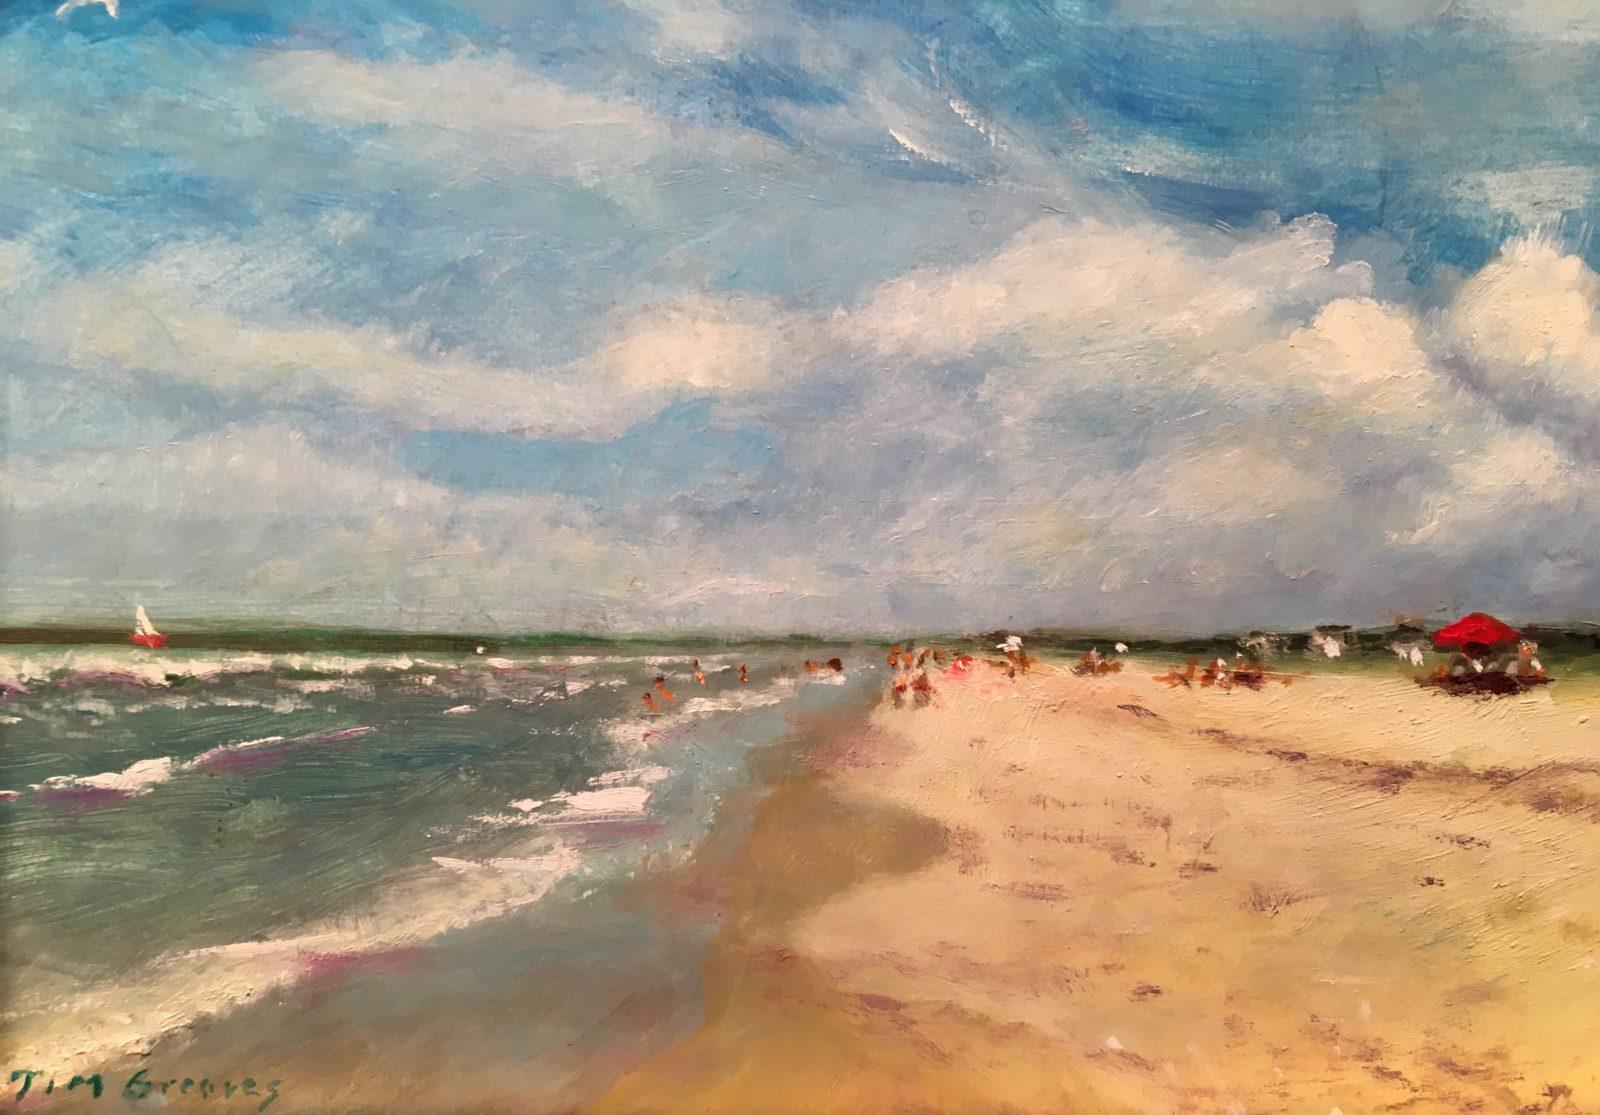 Tim Greaves, Bright Beach